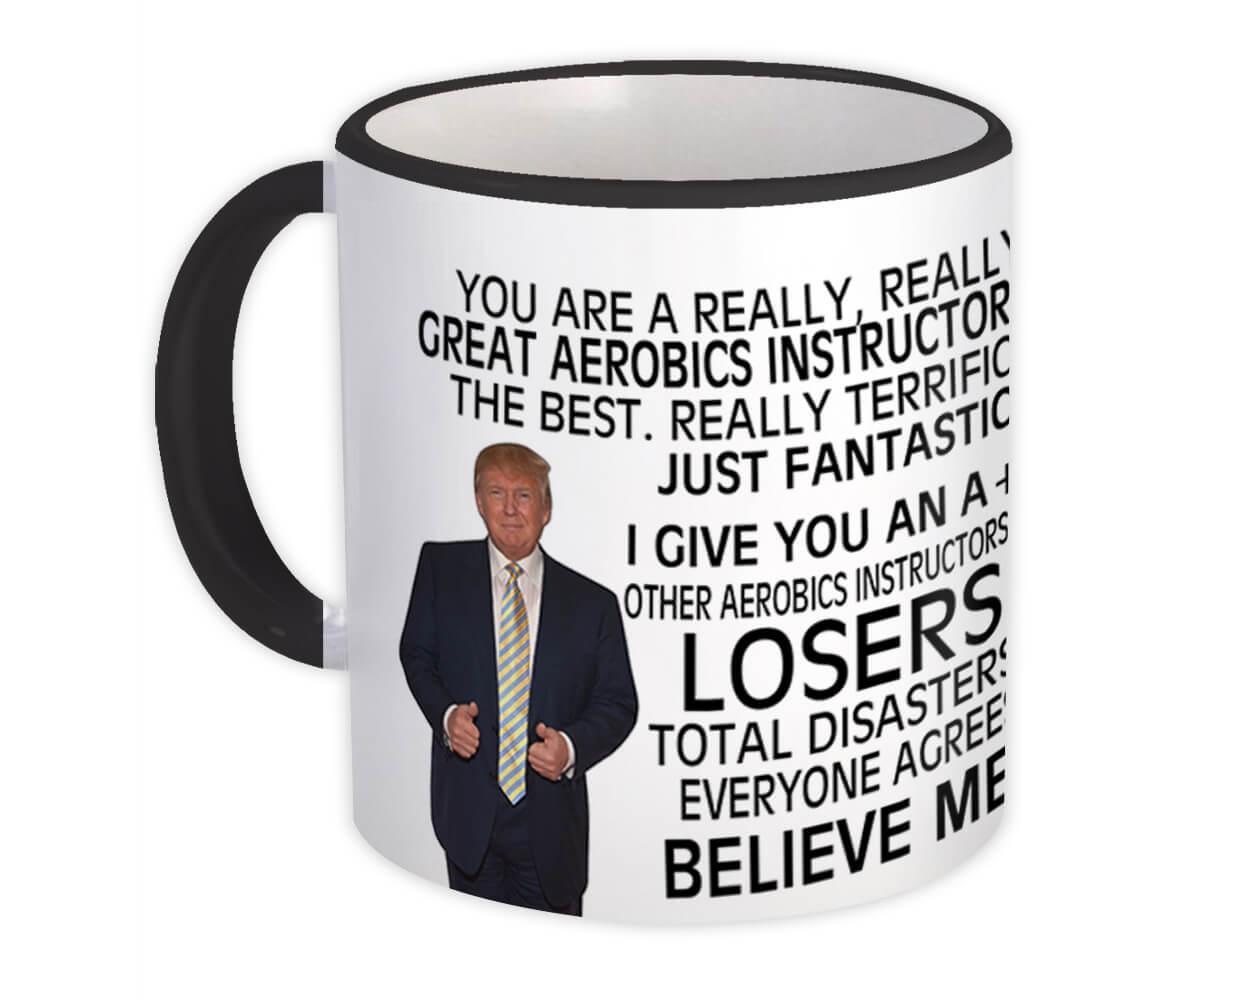 Gift for Aerobics Instructor : Gift Mug Donald Trump Great Aerobics Instructor Funny Christmas